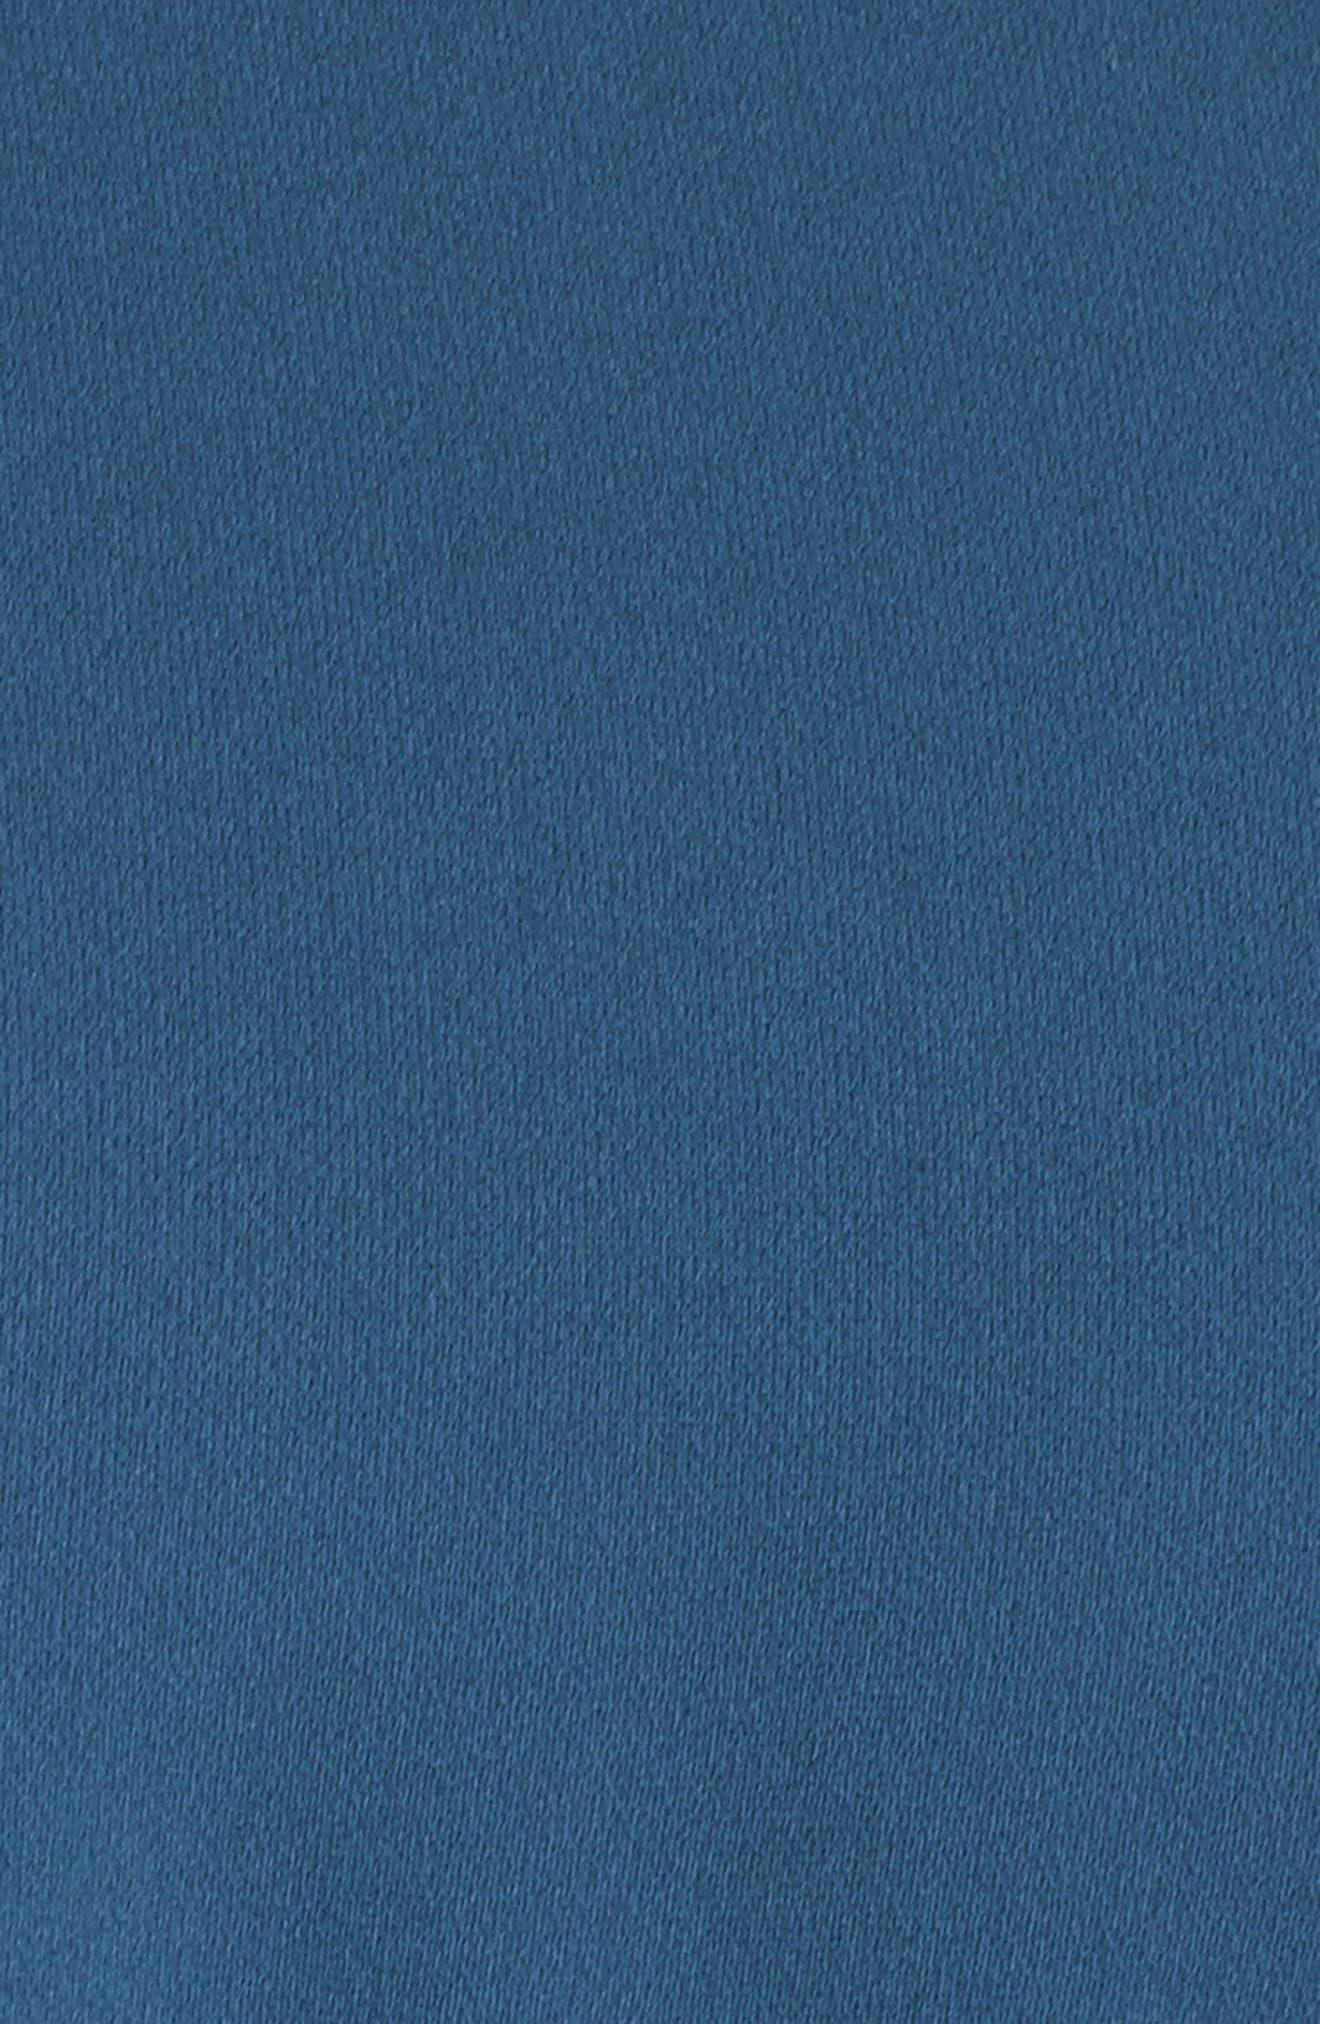 St Germain Ruffle Fit & Flare Dress,                             Alternate thumbnail 10, color,